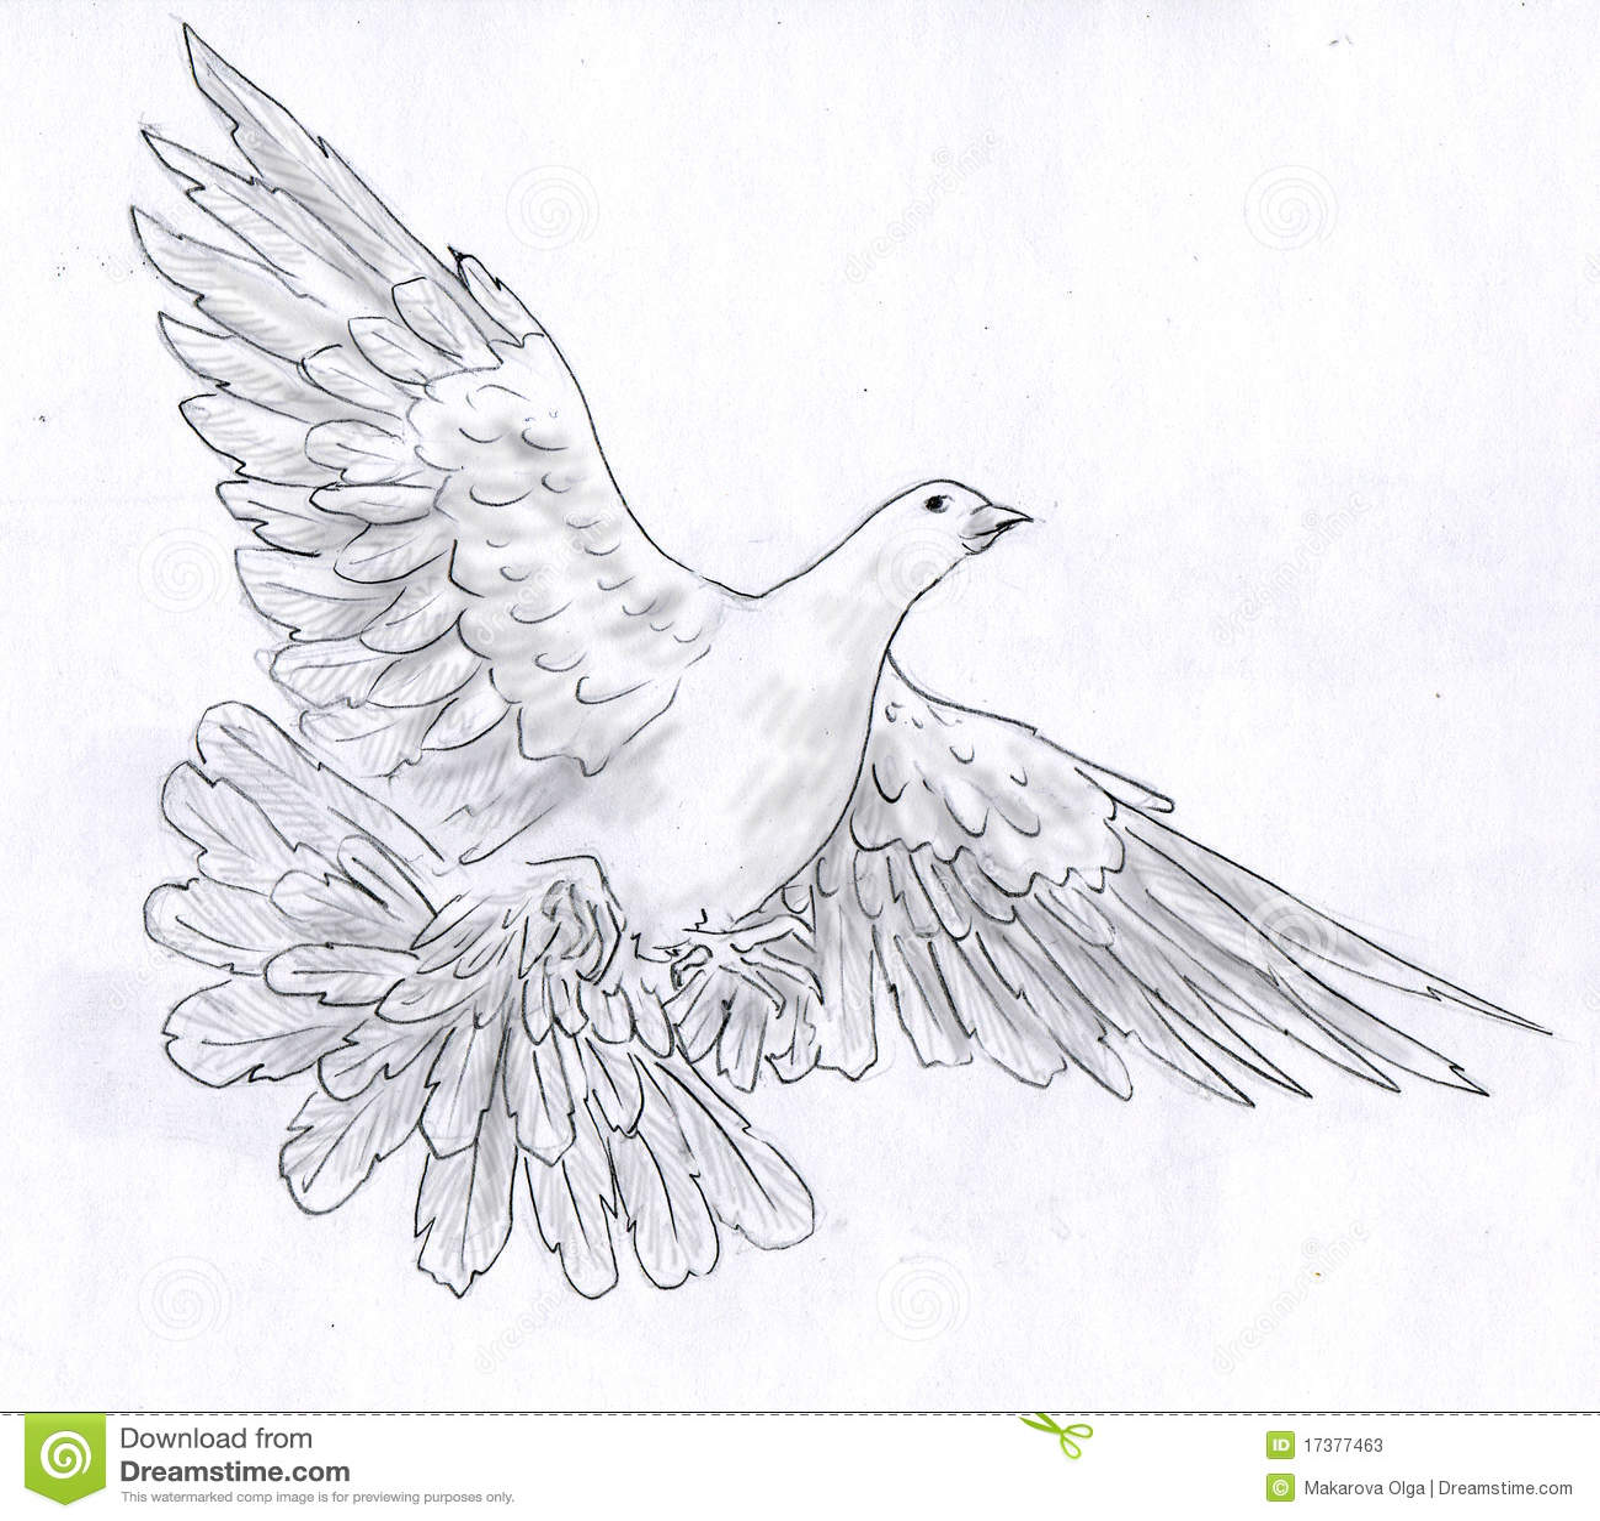 White dove pencil sketch stock illustration illustration of white dove pencil sketch buycottarizona